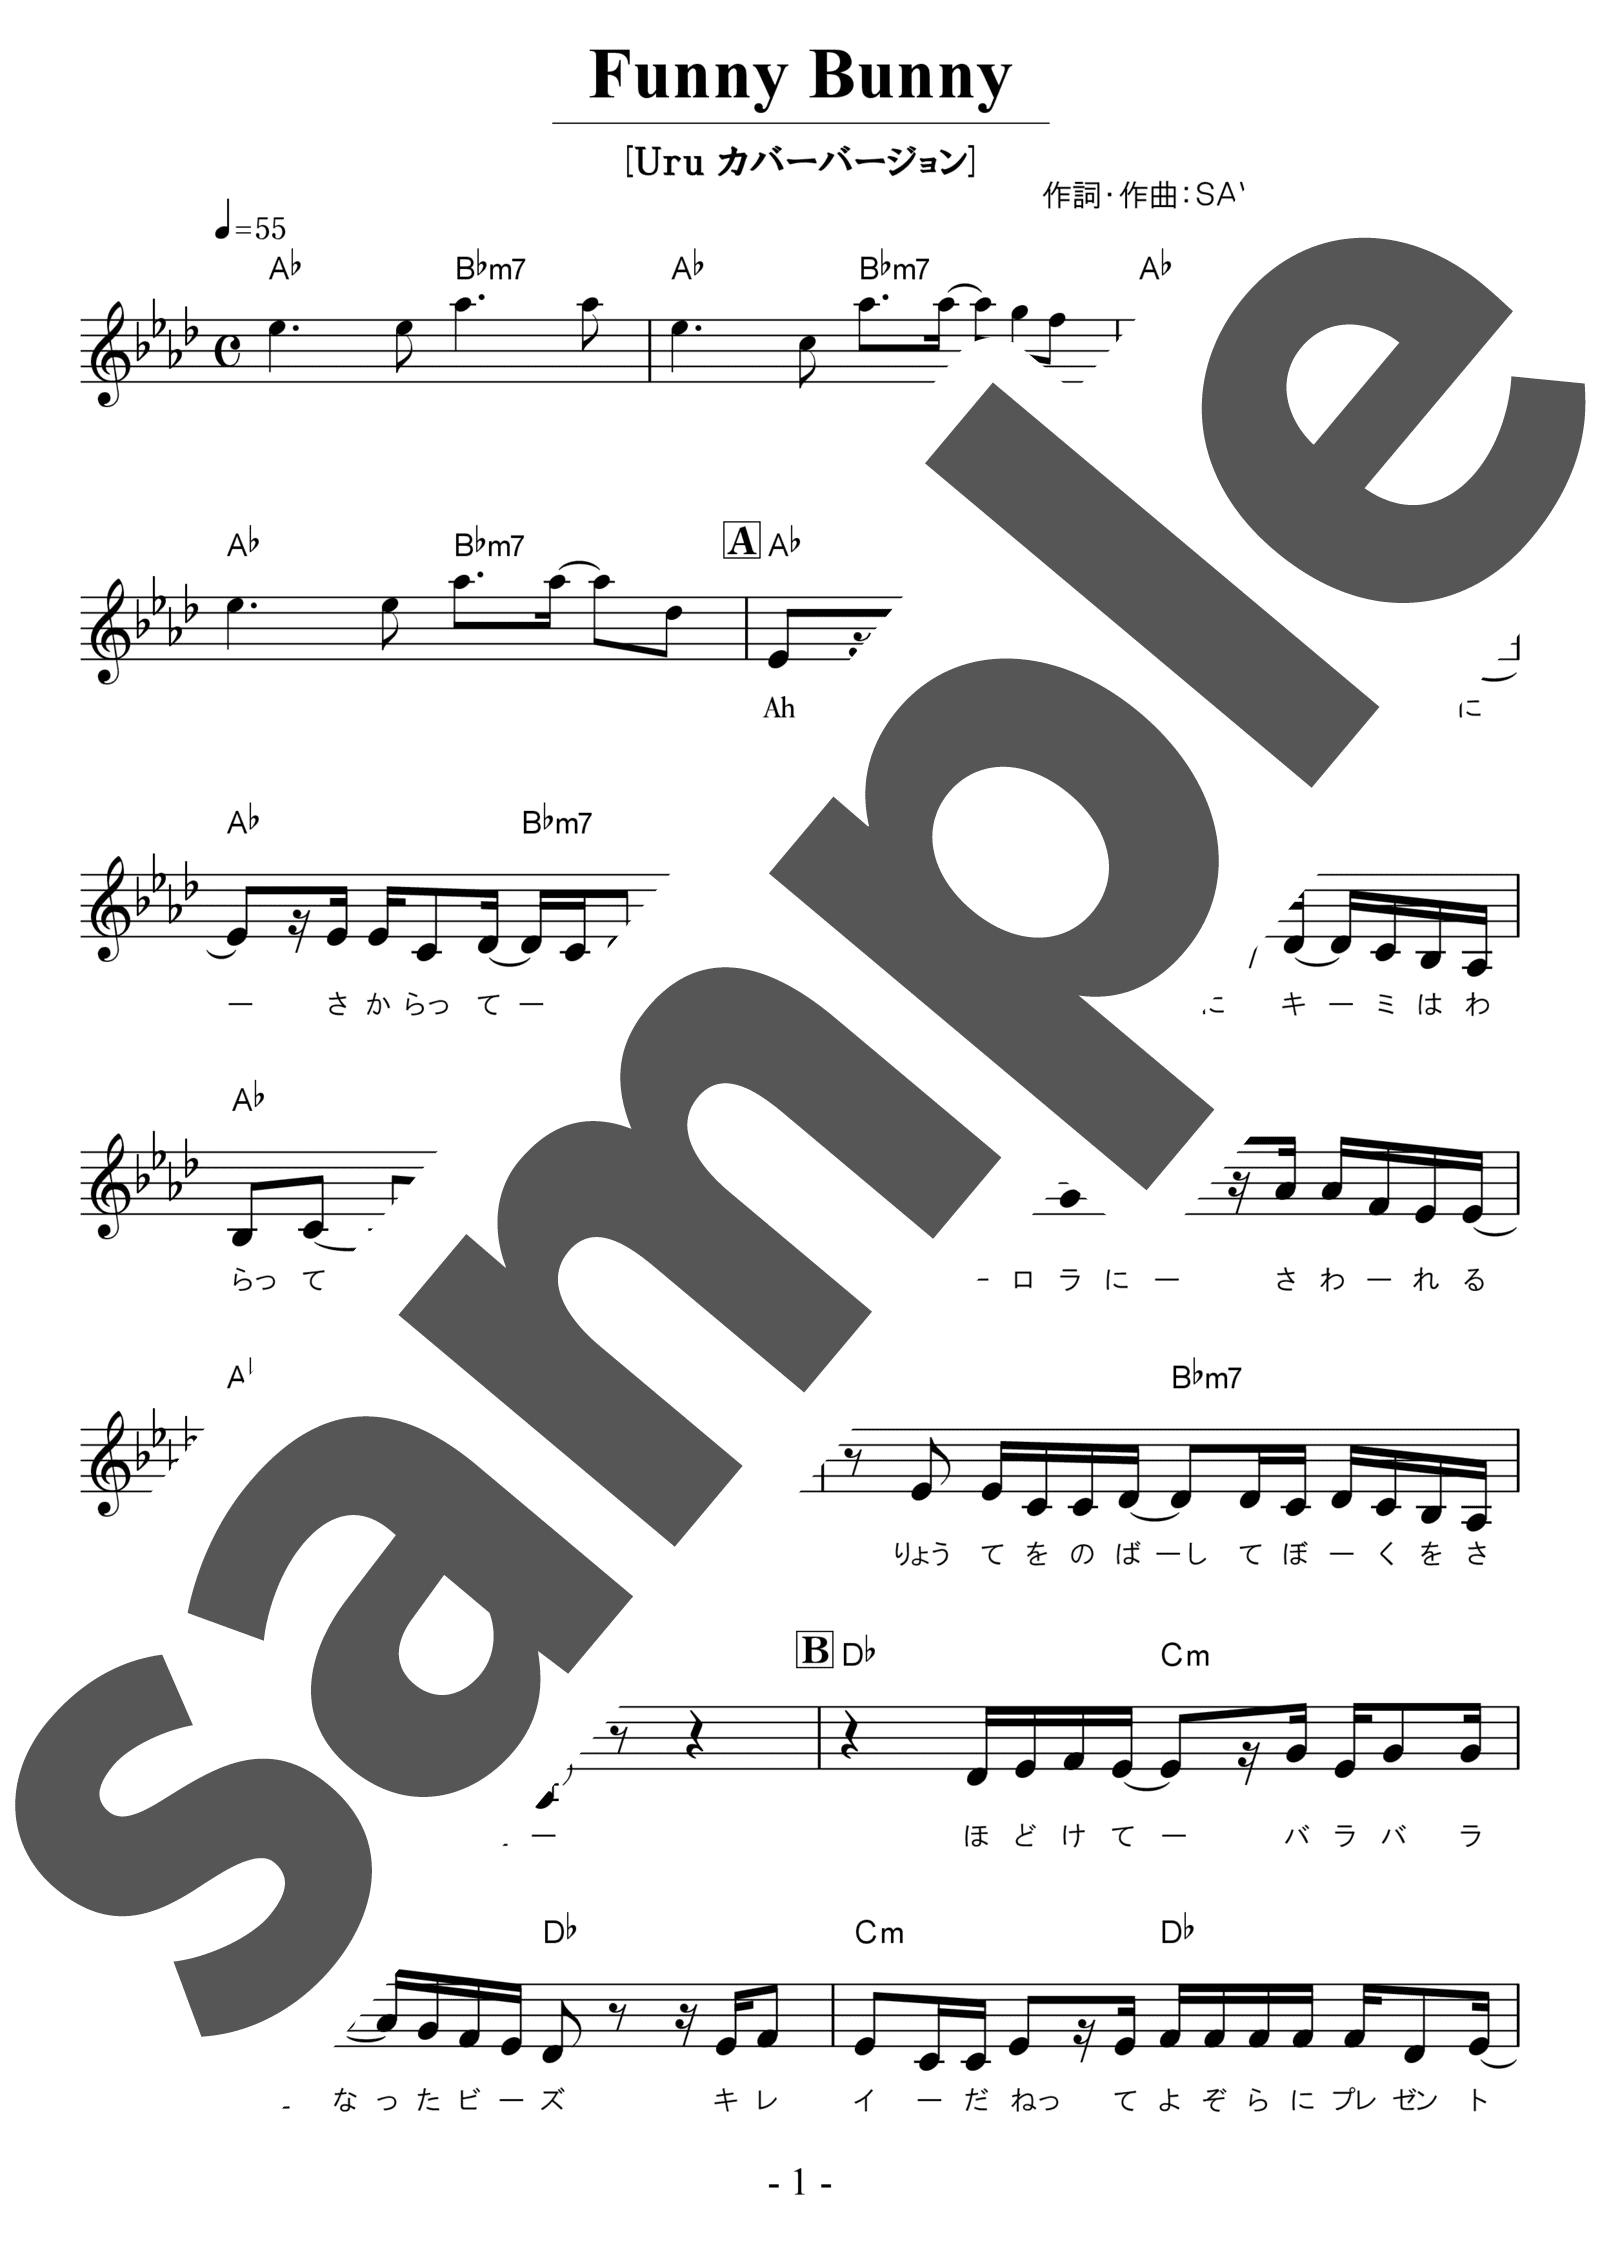 「Funny Bunny」のサンプル楽譜